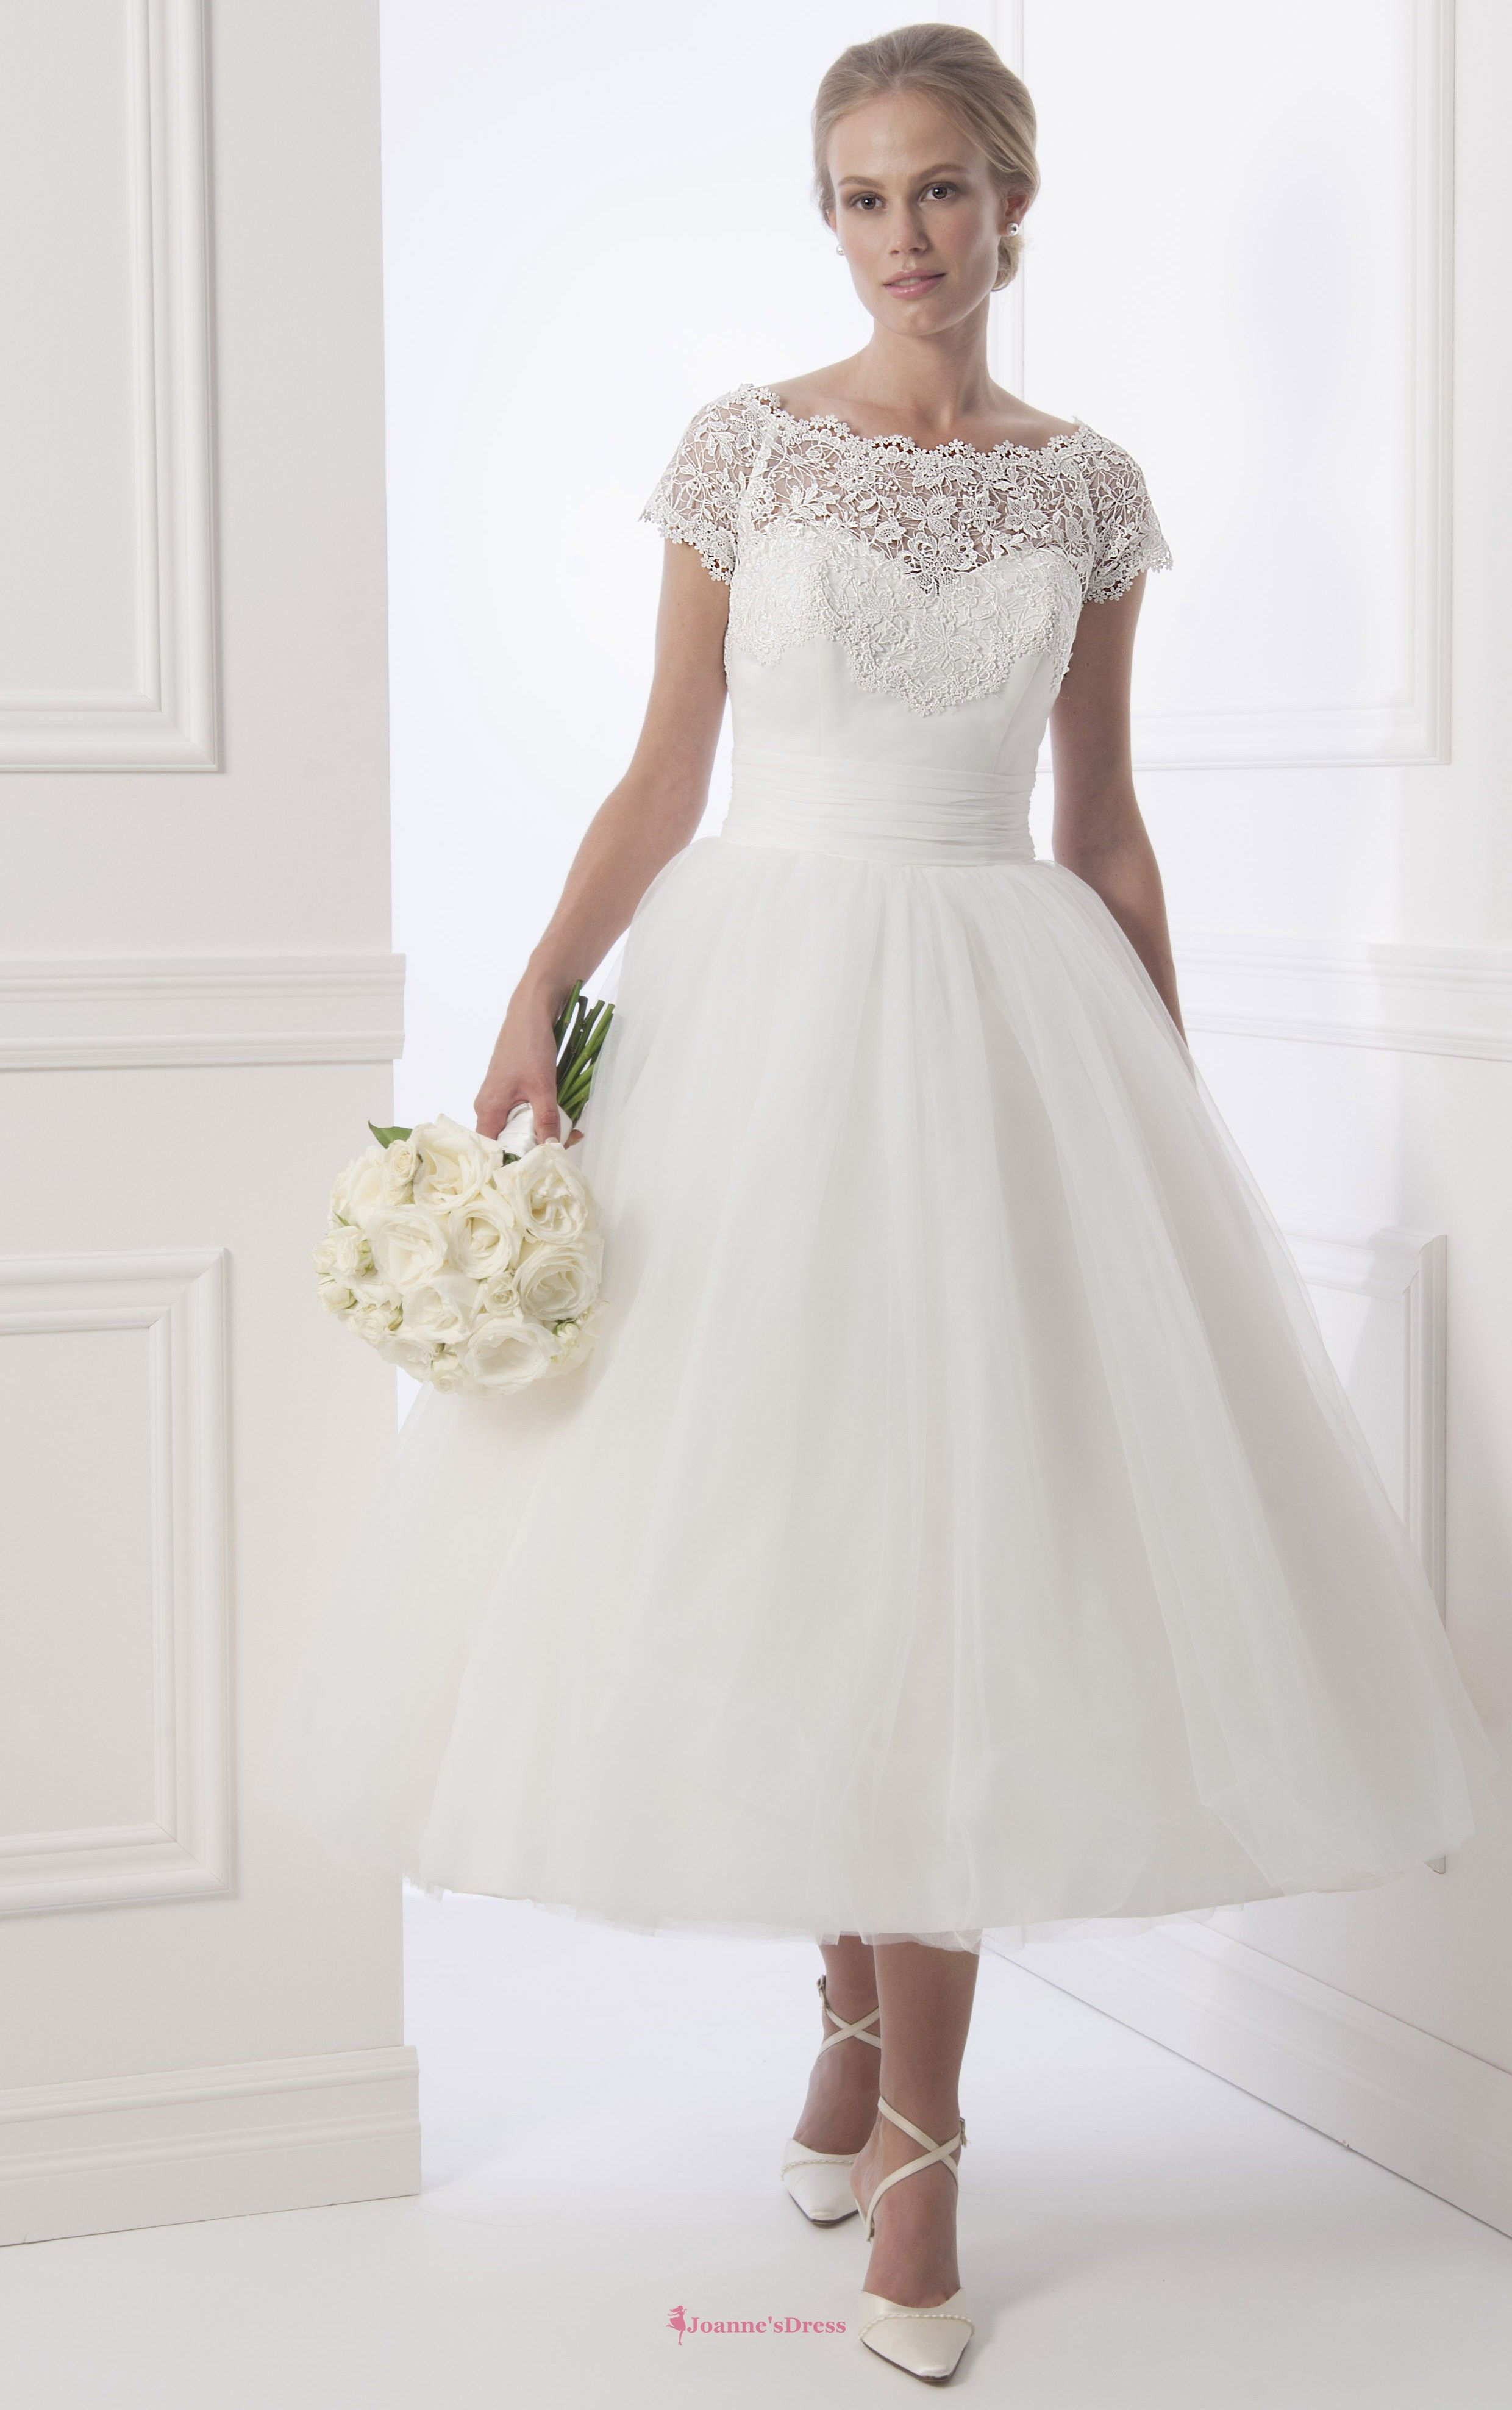 Plus size wedding dress designers  Fairytale Bateau Aline Tealength Wedding Dress With Lace  Wedding